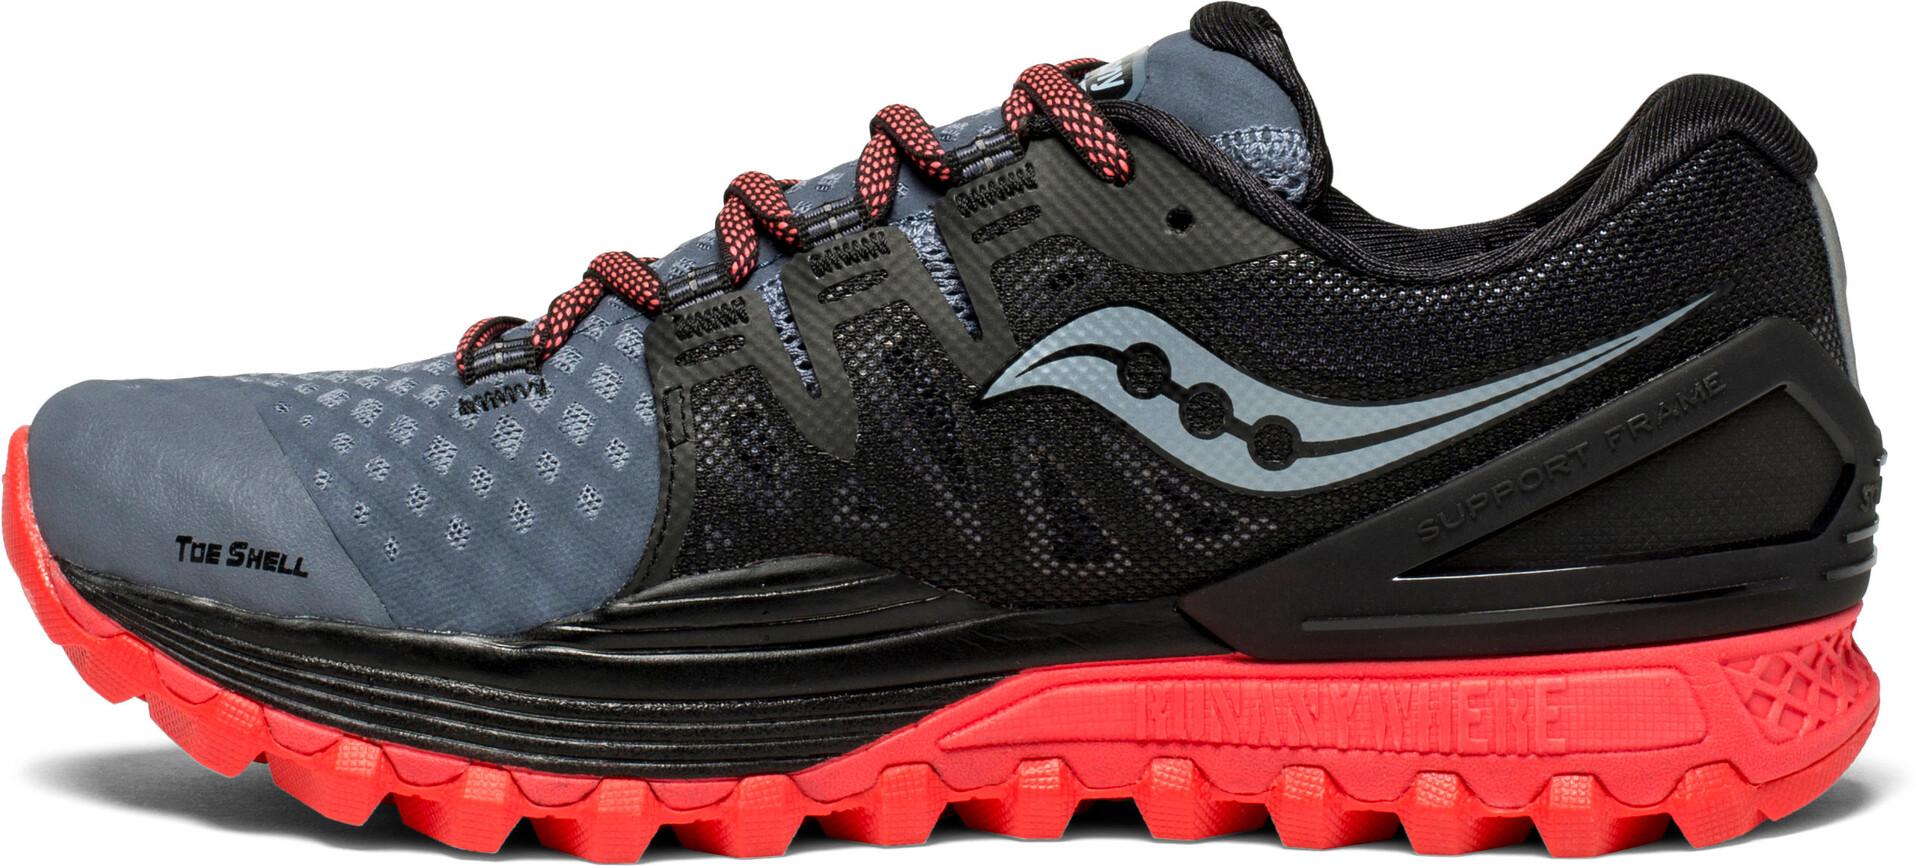 Red Xodus Iso FemmeGreyblackvizipro Chaussures 2 Saucony WQerBdxCo